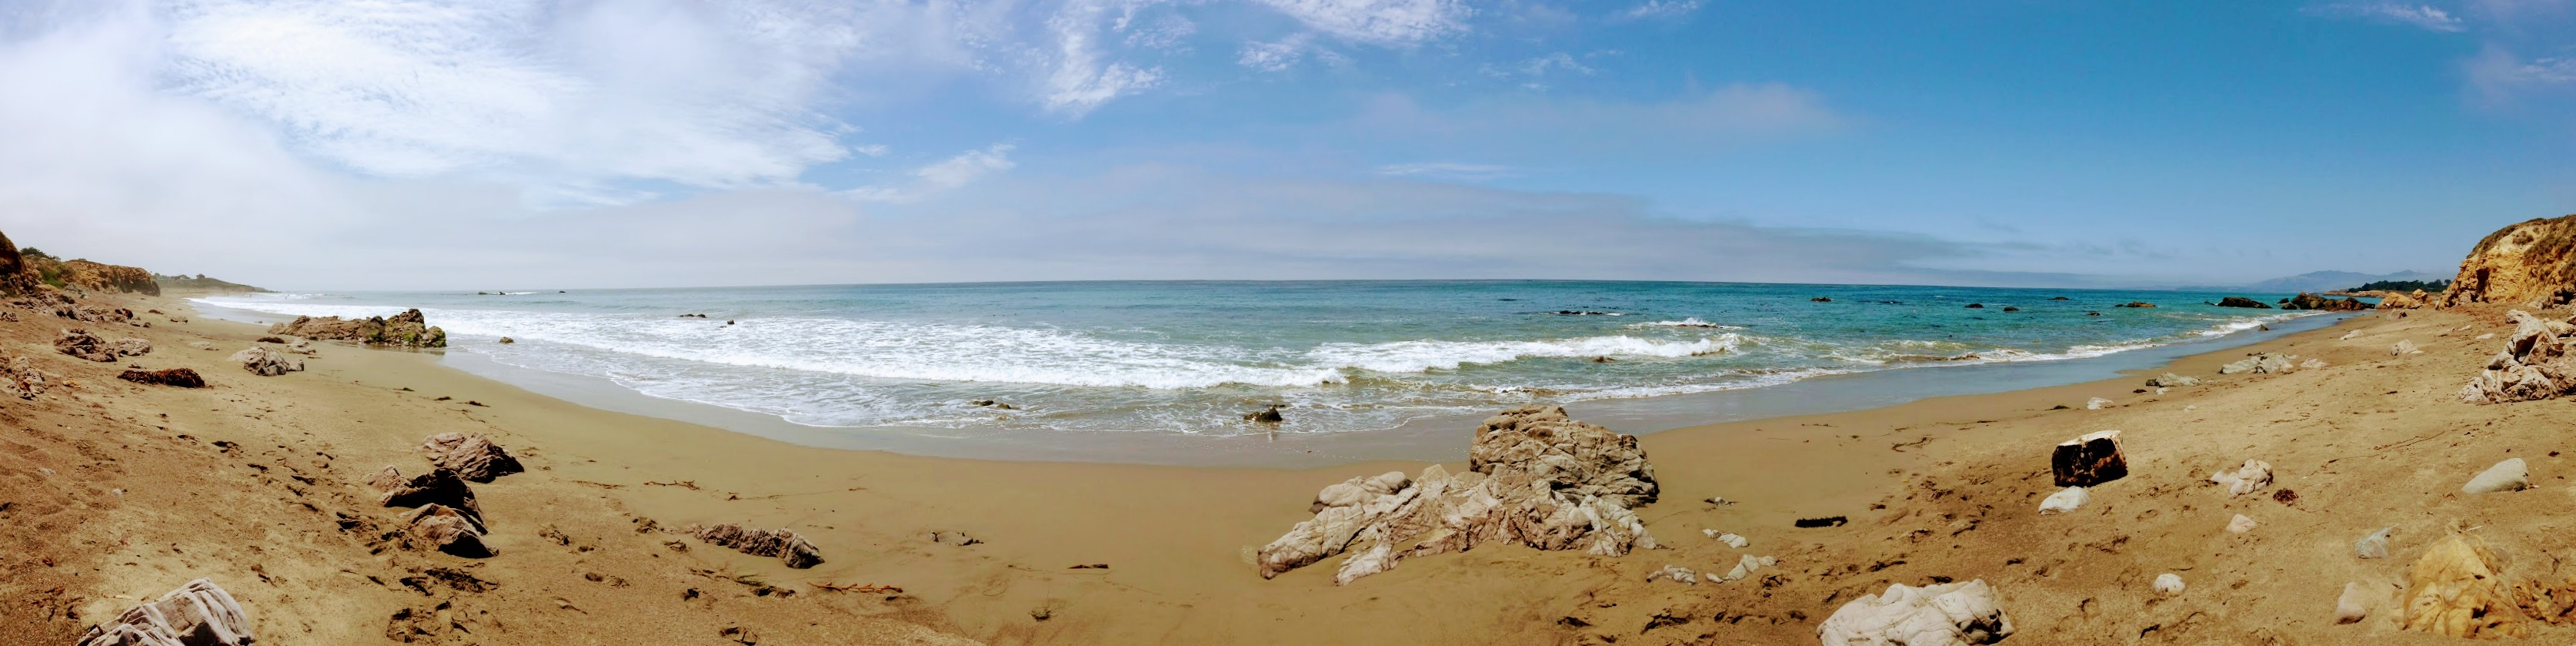 Westkust Amerika Moonstone Beach